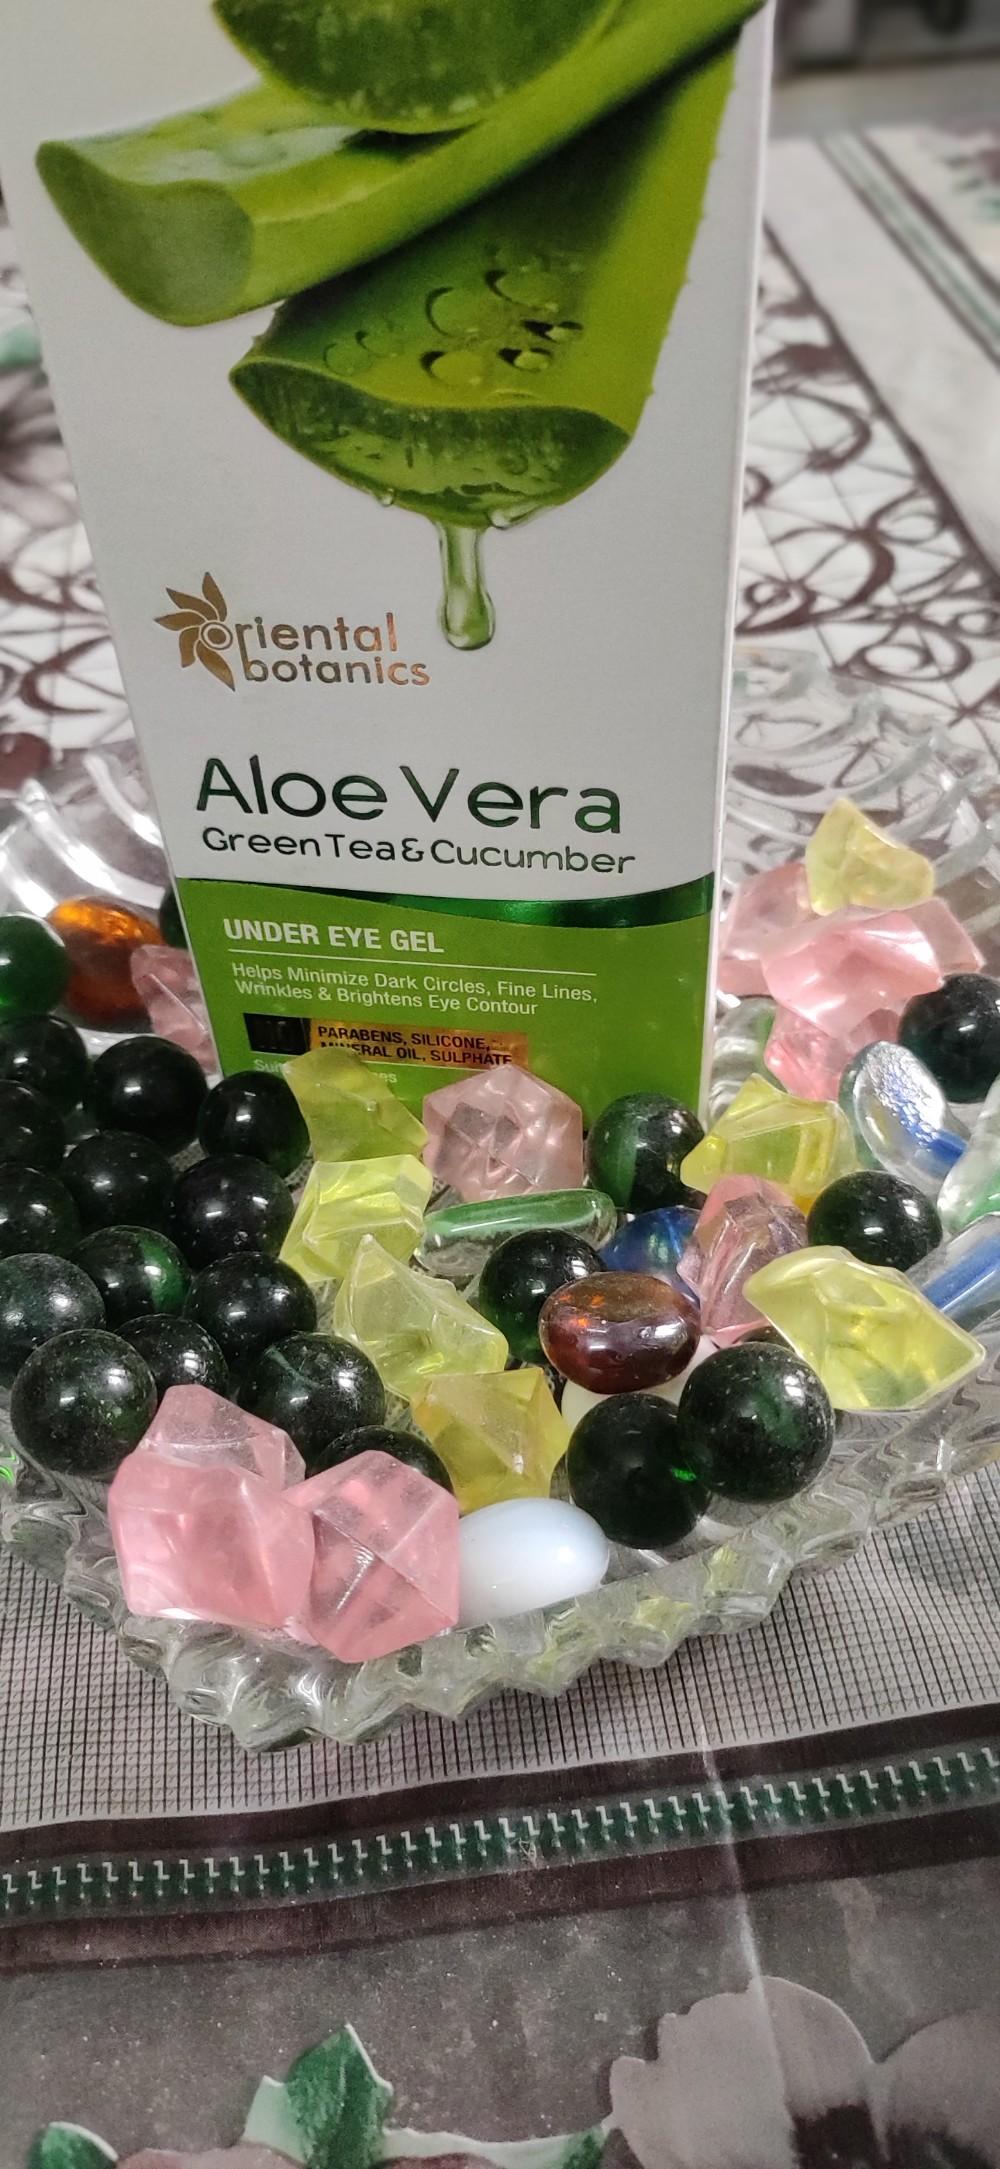 Oriental Botanics Aloe Vera Green Tea & Cucumber Under Eye Gel pic 2-Best for dark circles-By shivani_soni